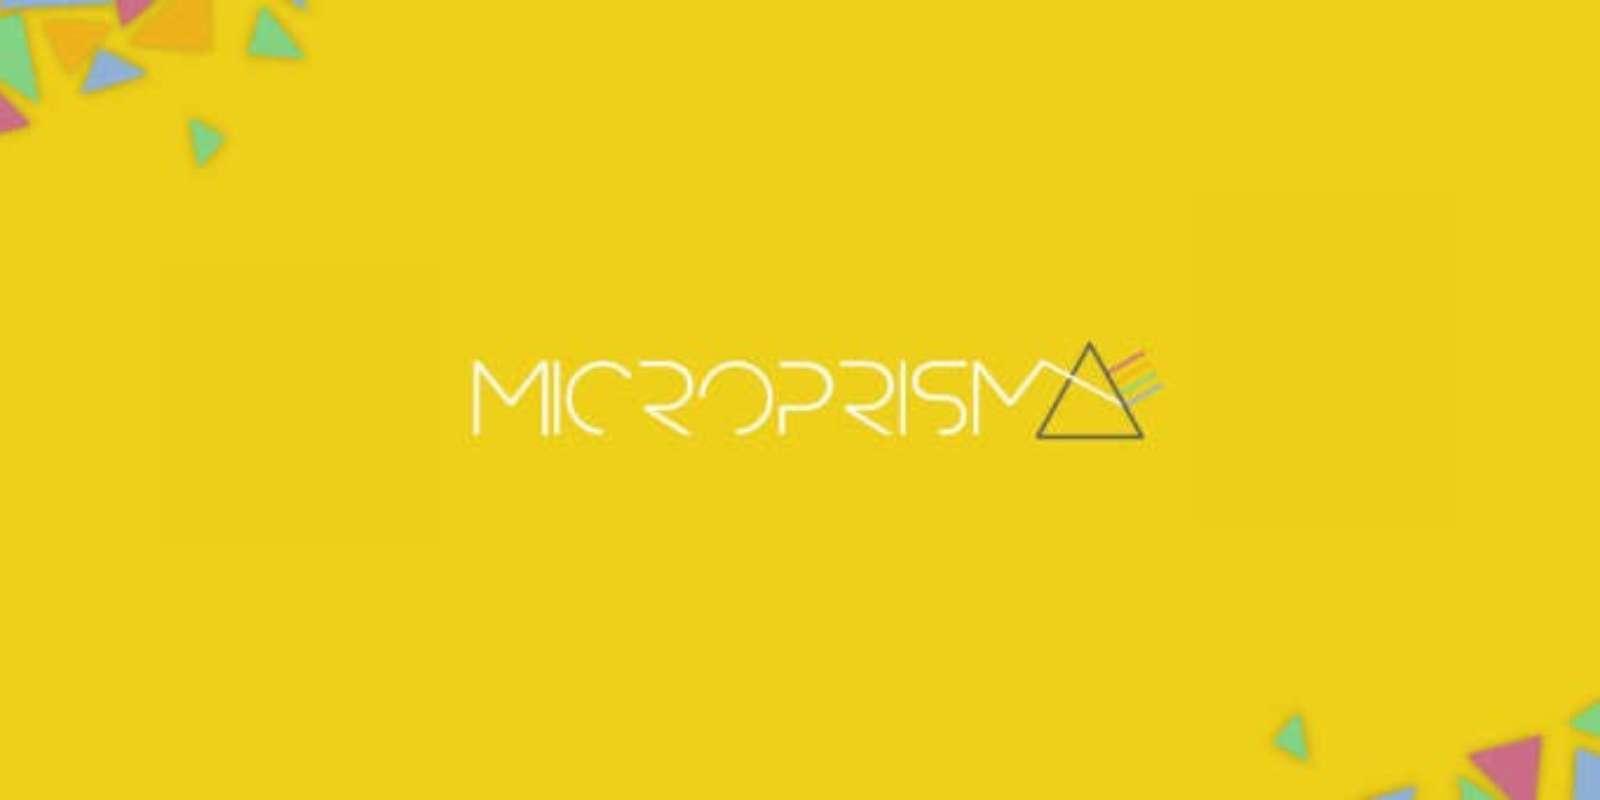 Microprisma-logo_sq_header